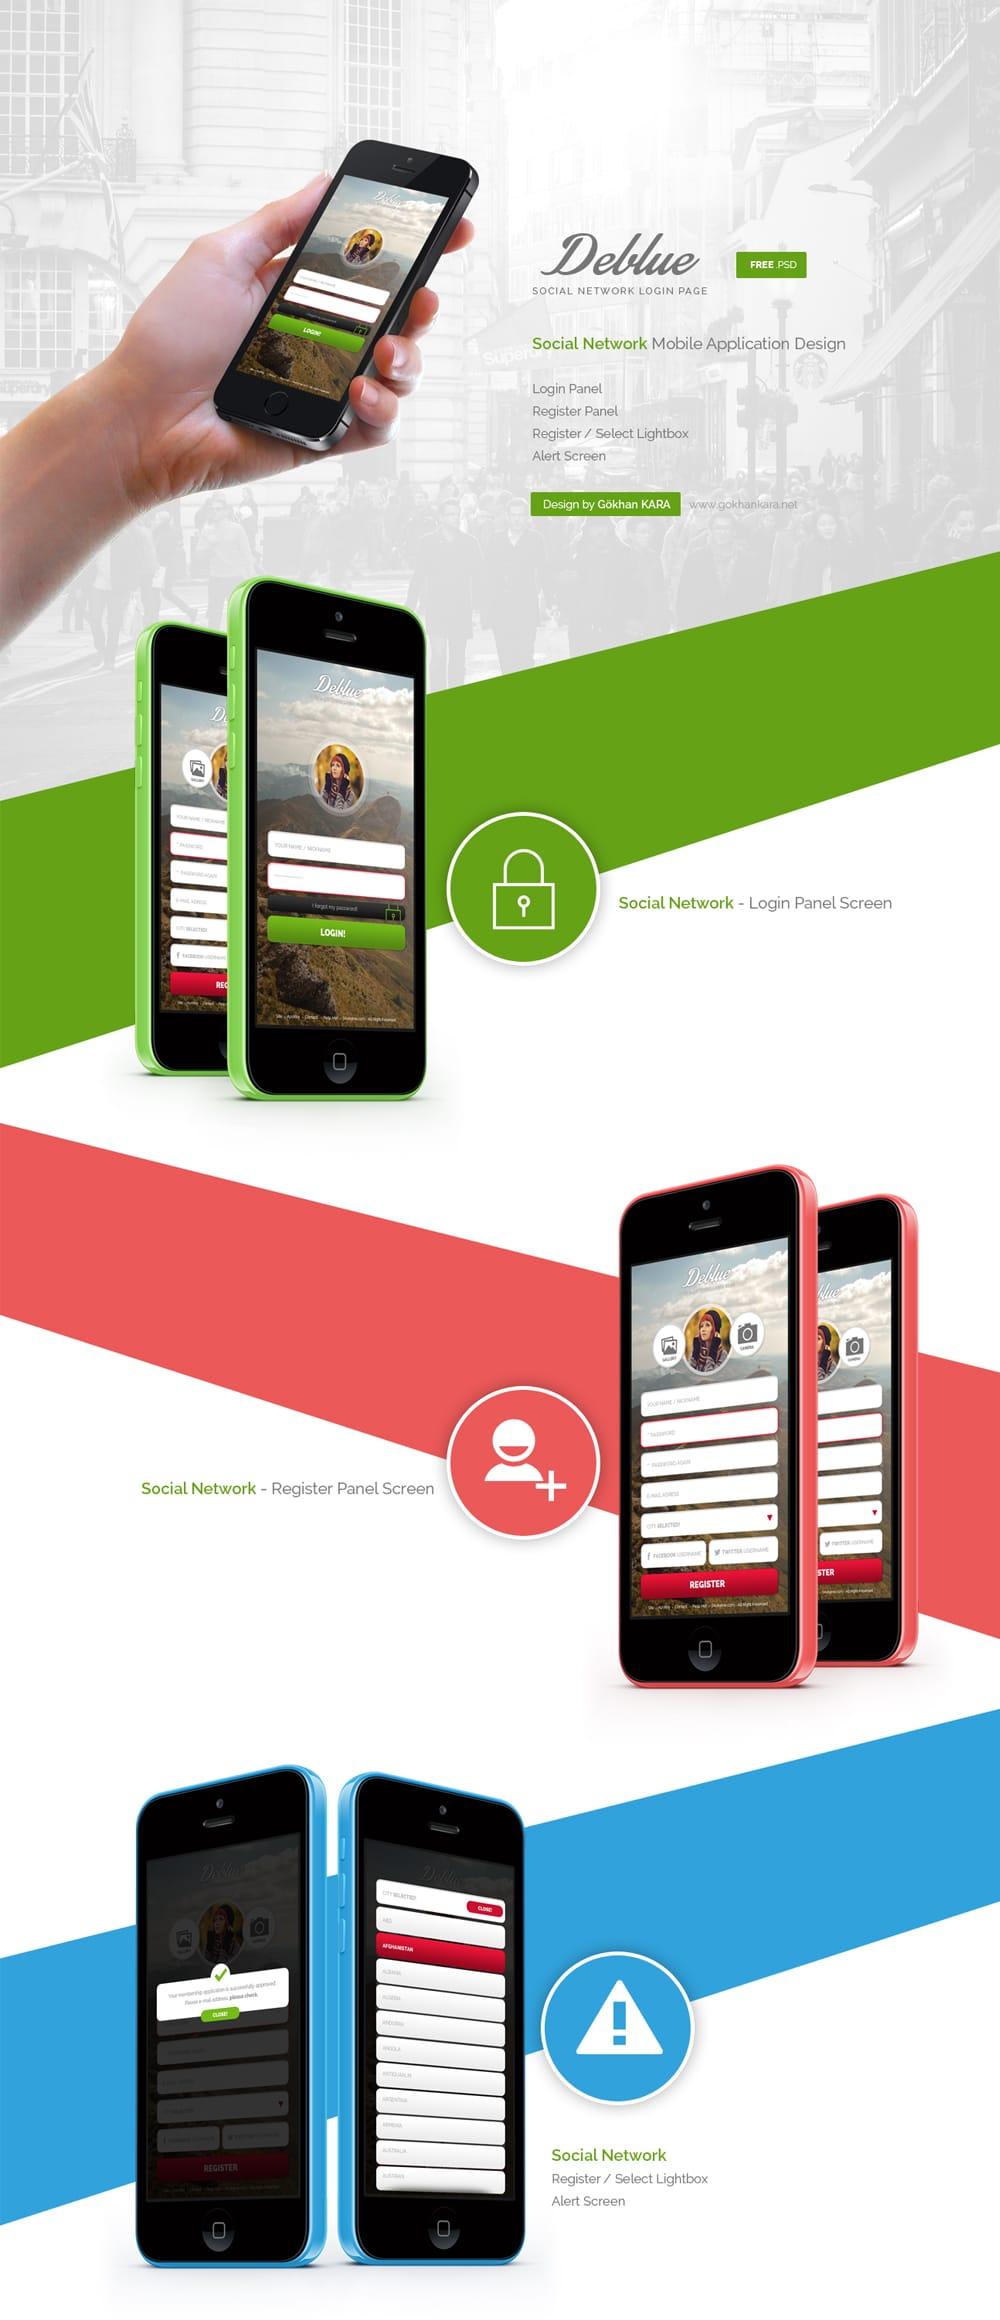 Deblue – Social Network App Design PSD